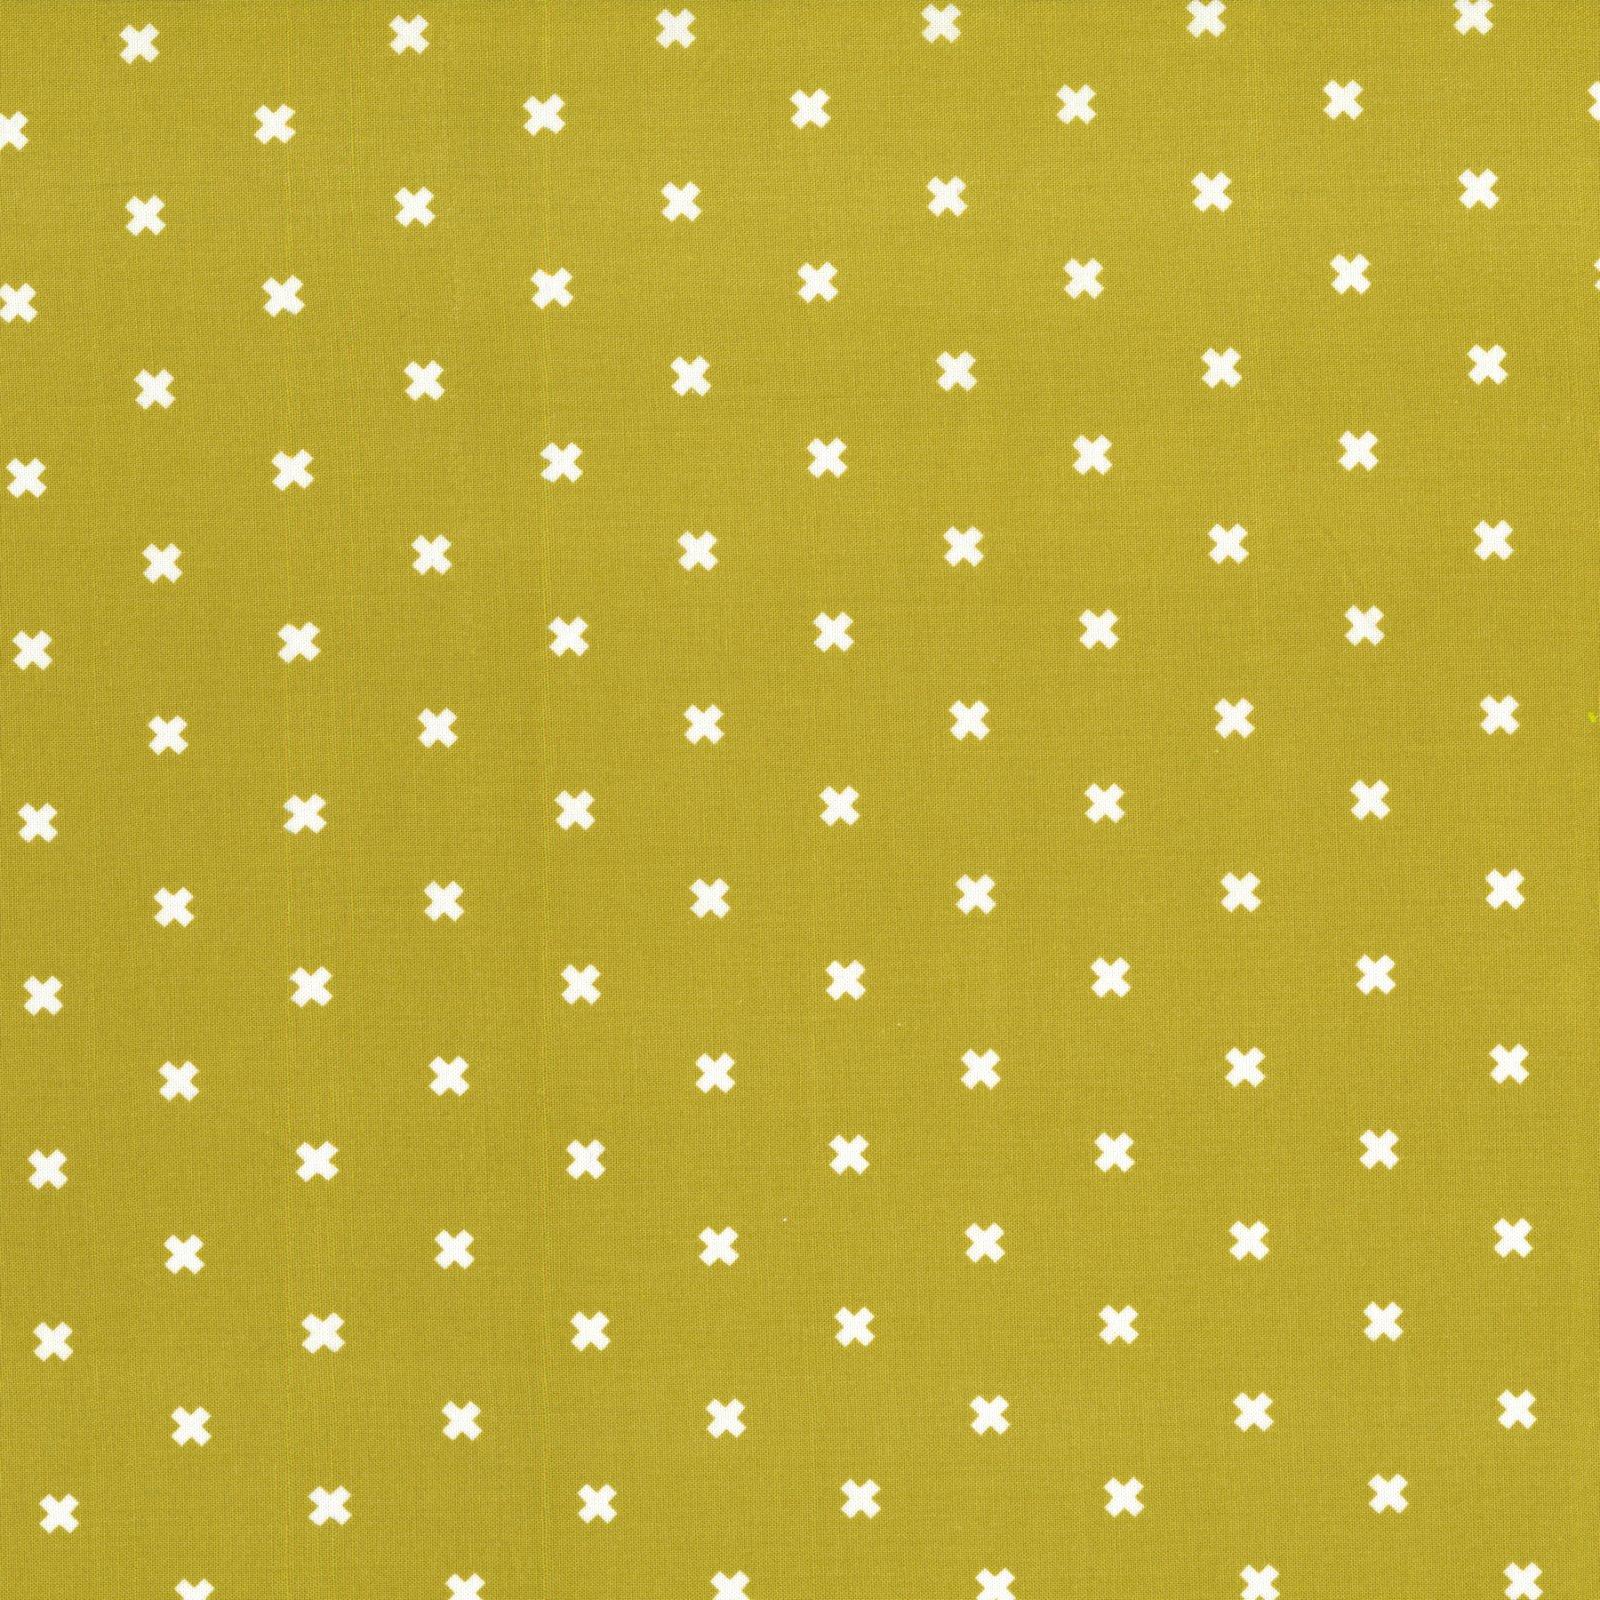 XOXO, Shag Carpet, Cotton and Steel Basics